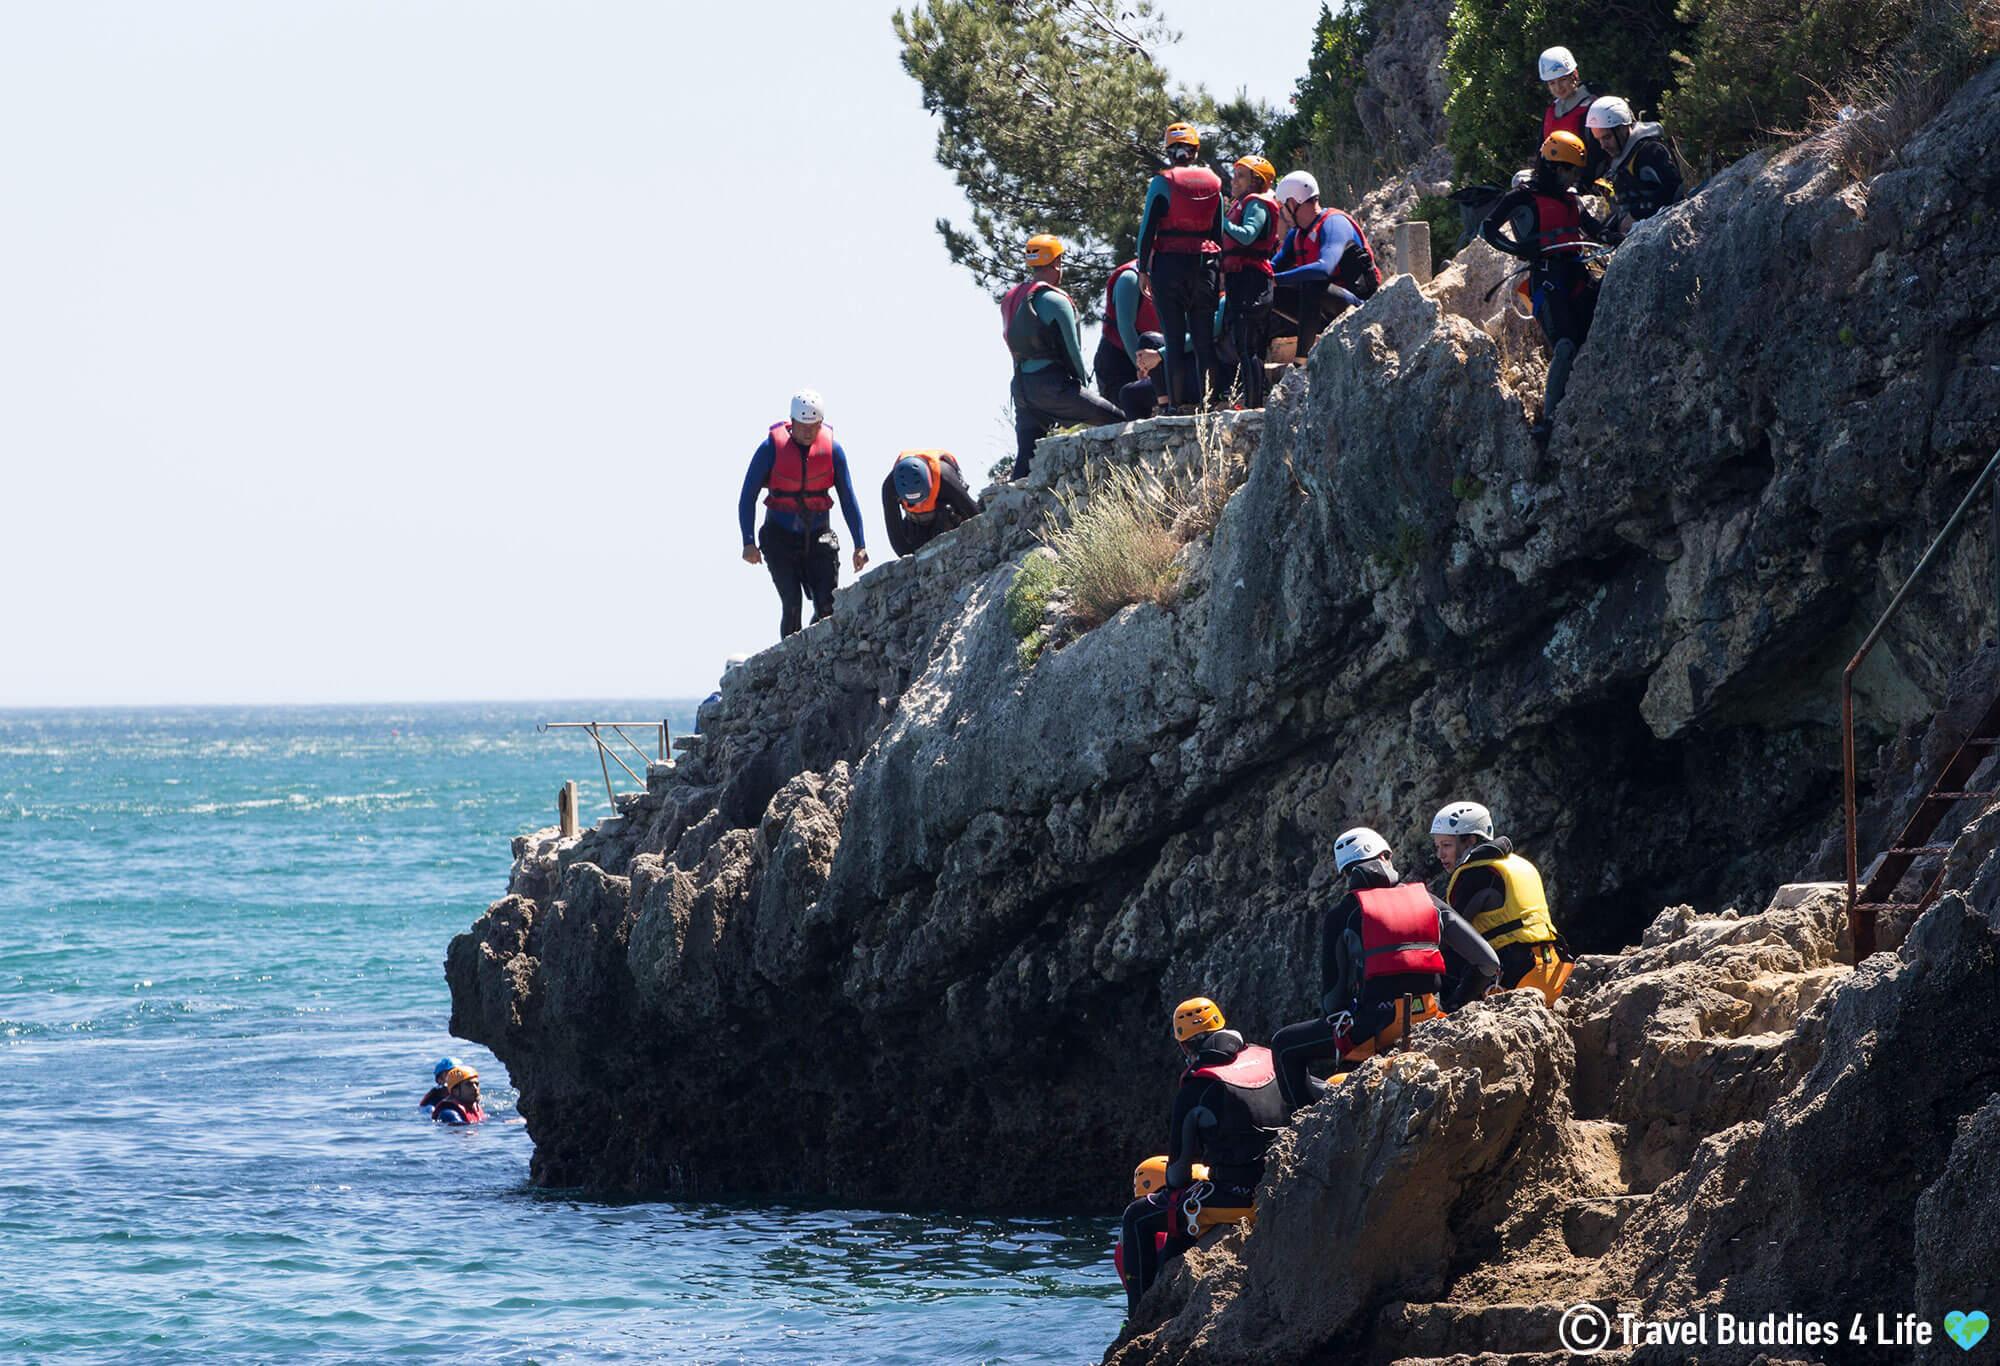 WIND Group Sitting on the Serra da Arrábida coast ready to Cliff Jump